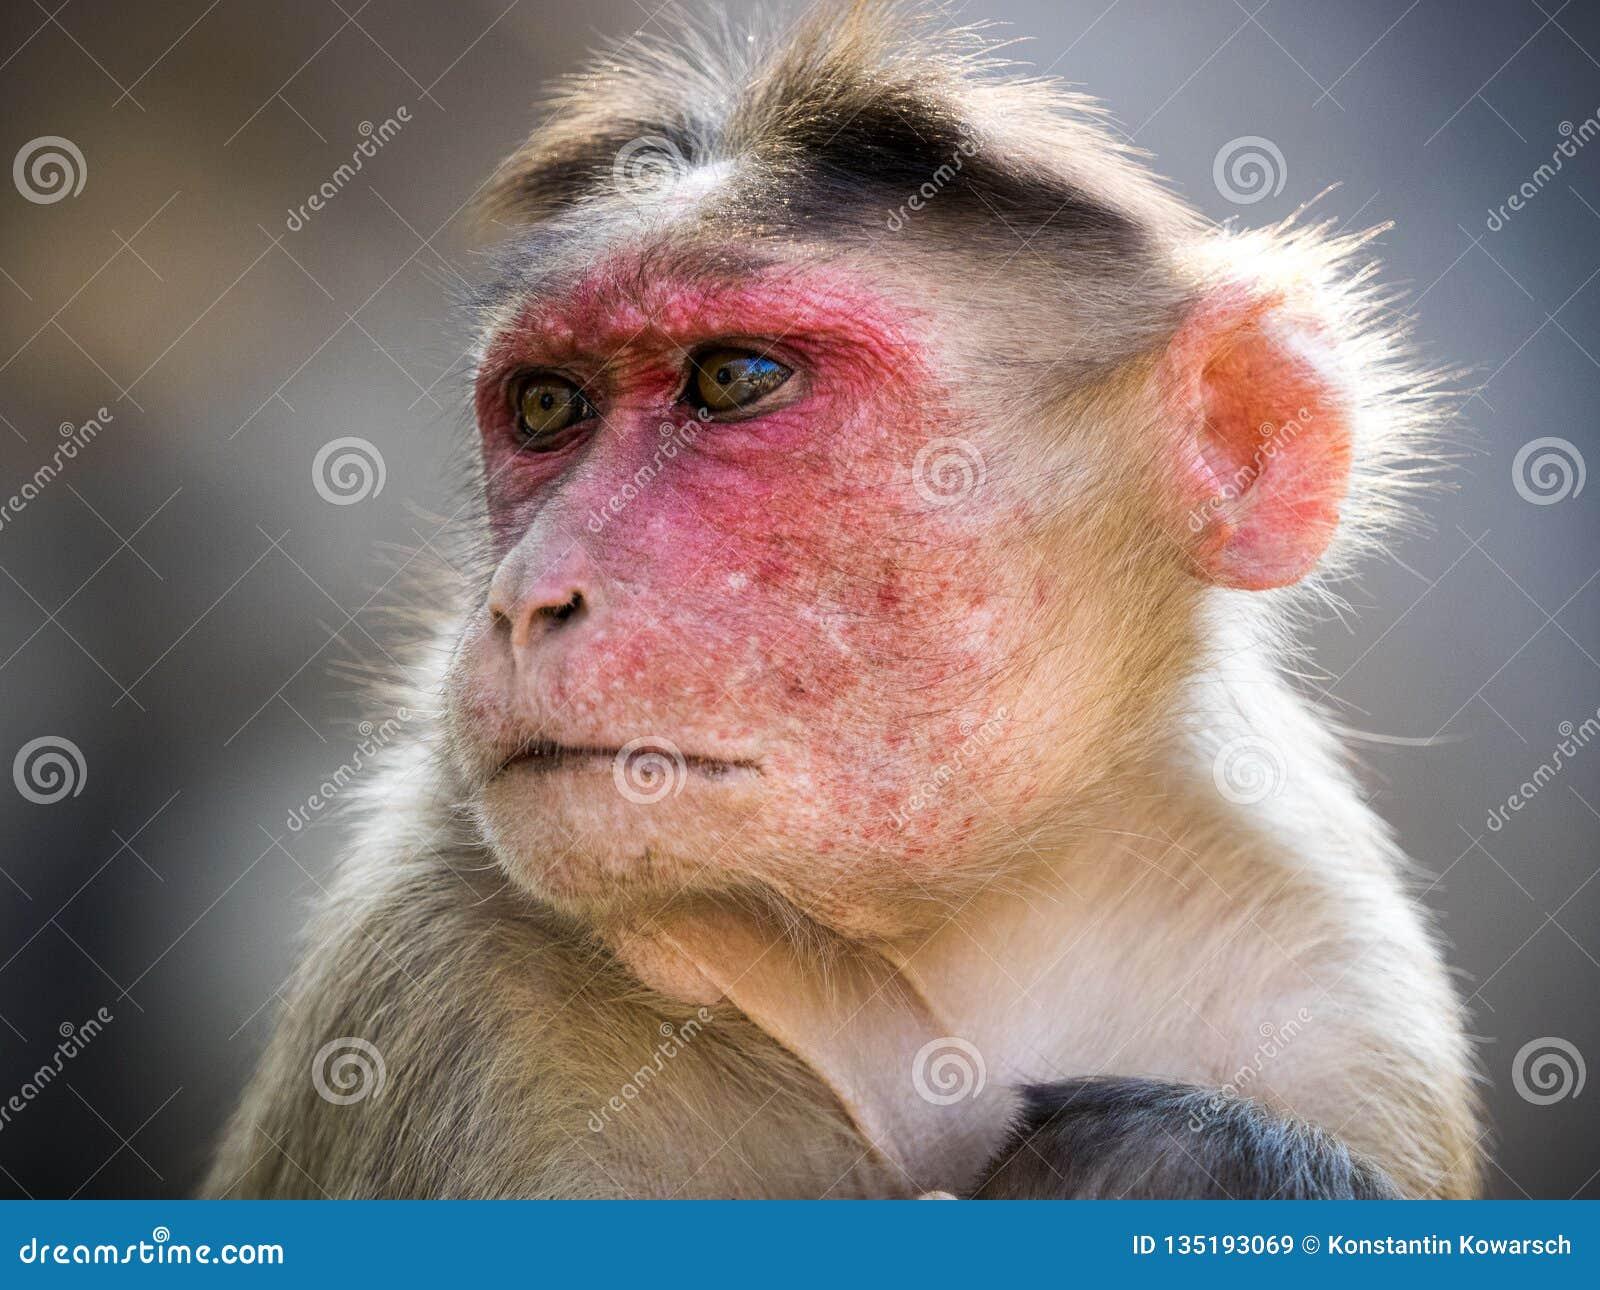 Rhesus monkey in india portrait